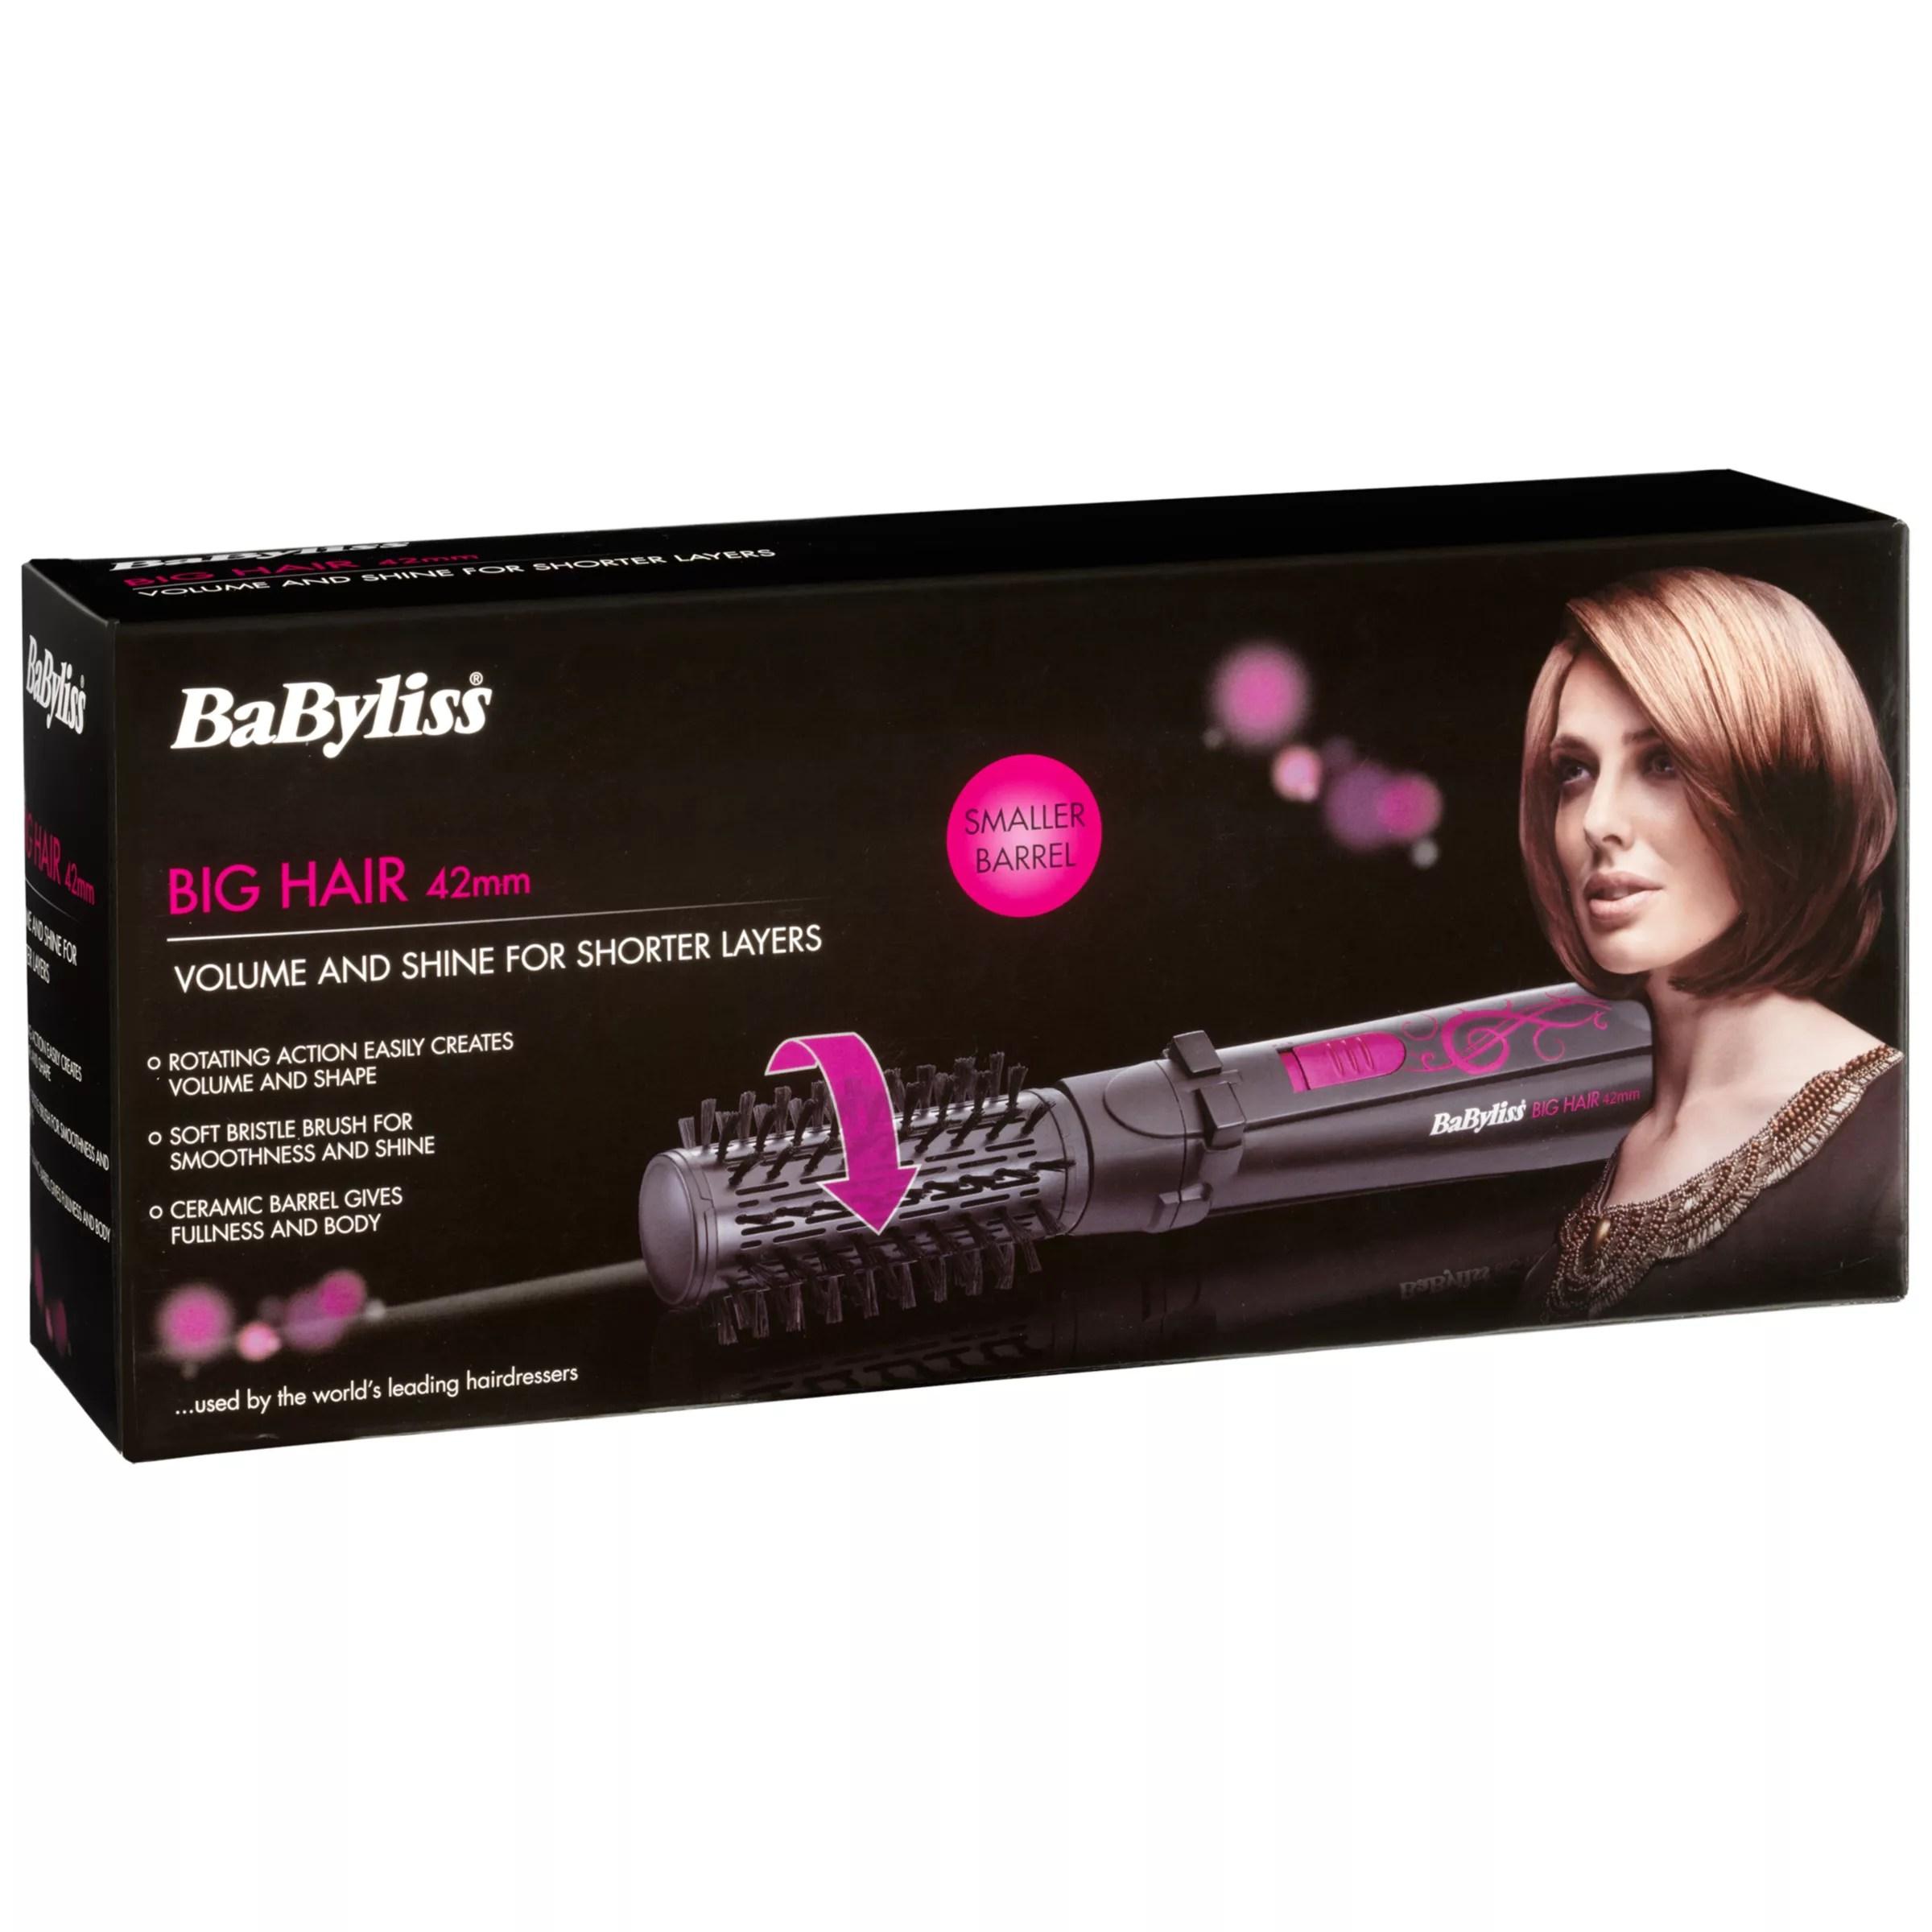 Buy BaByliss Big Hair 2777U 42mm Styler John Lewis